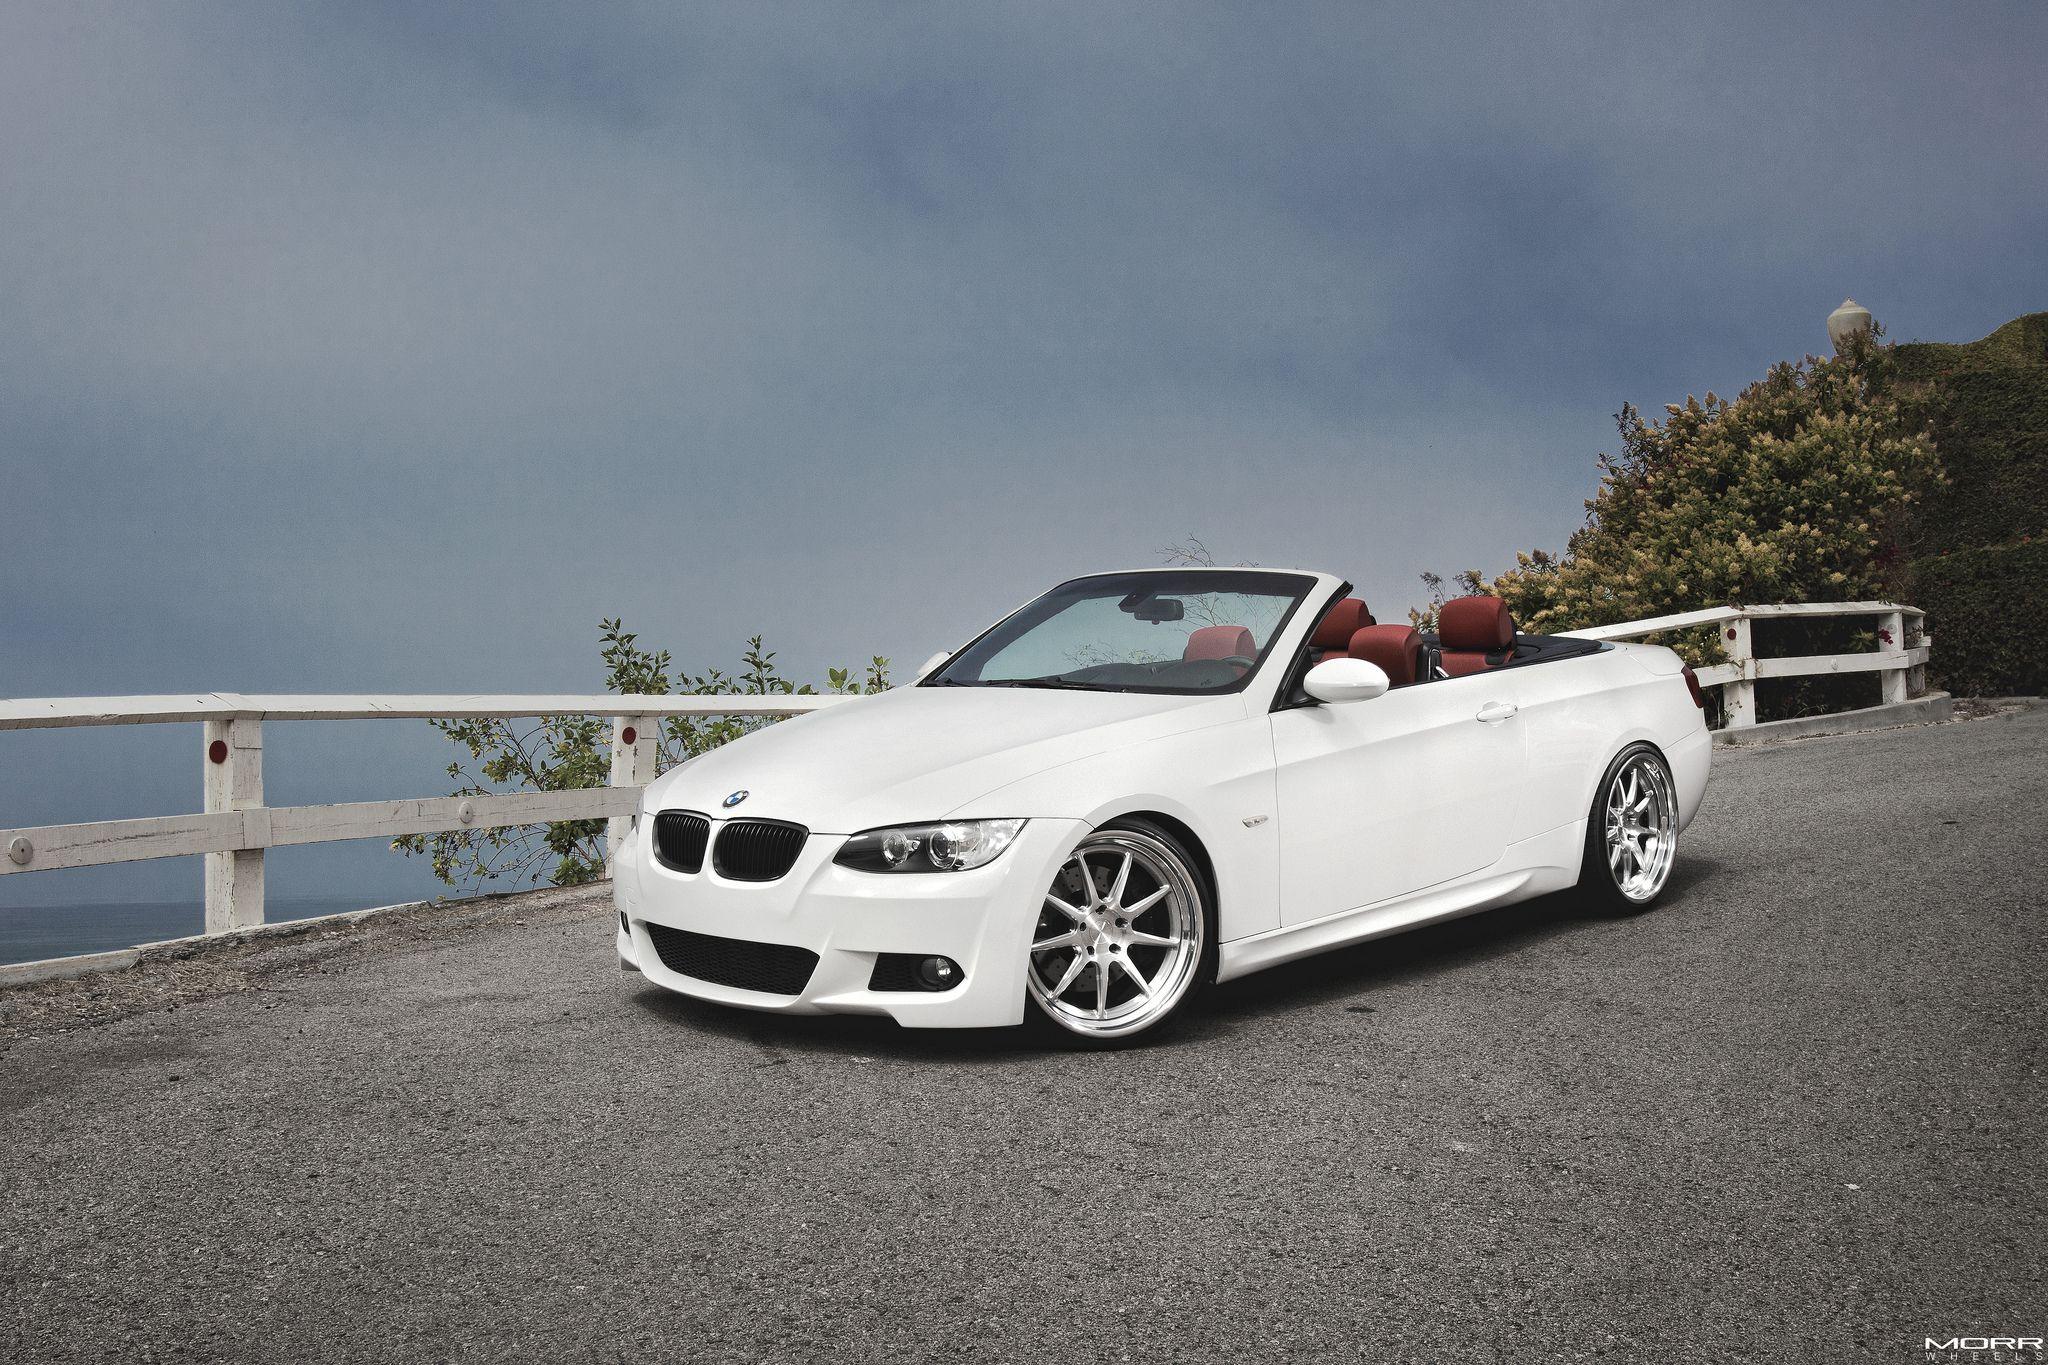 alpine white bmw 335i convertible on morr wheels. Black Bedroom Furniture Sets. Home Design Ideas